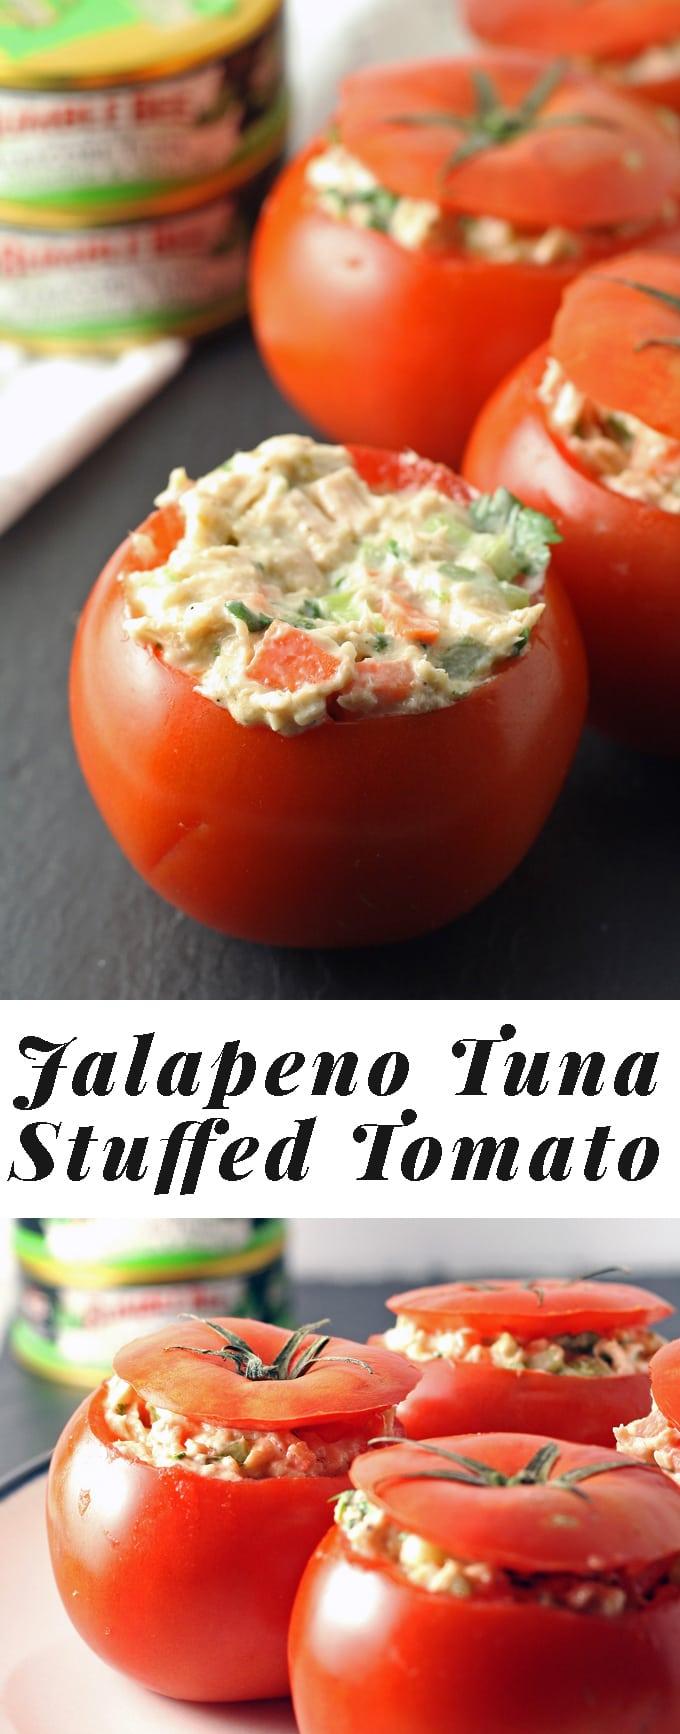 Jalapeno Tuna Stuffed Tomato Recipe - perfect for a quick lunch! | honeyandbirch.com #TunaStrong #CG